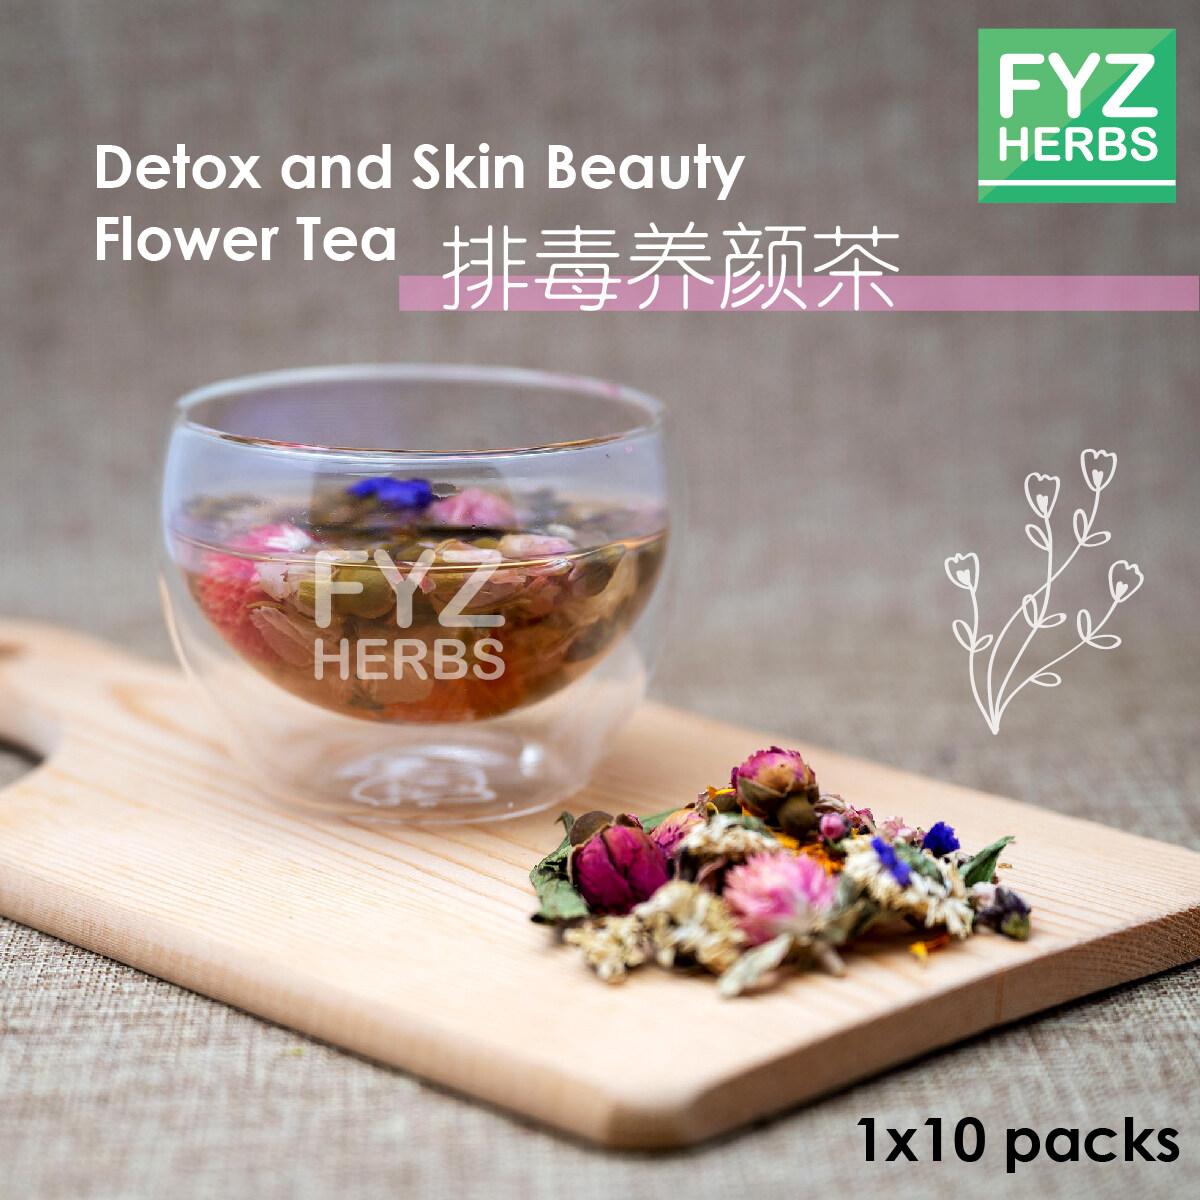 FYZ Herbs Detox and Skin Beauty Flower Tea 排毒养颜茶 ( 1 x 10packs)